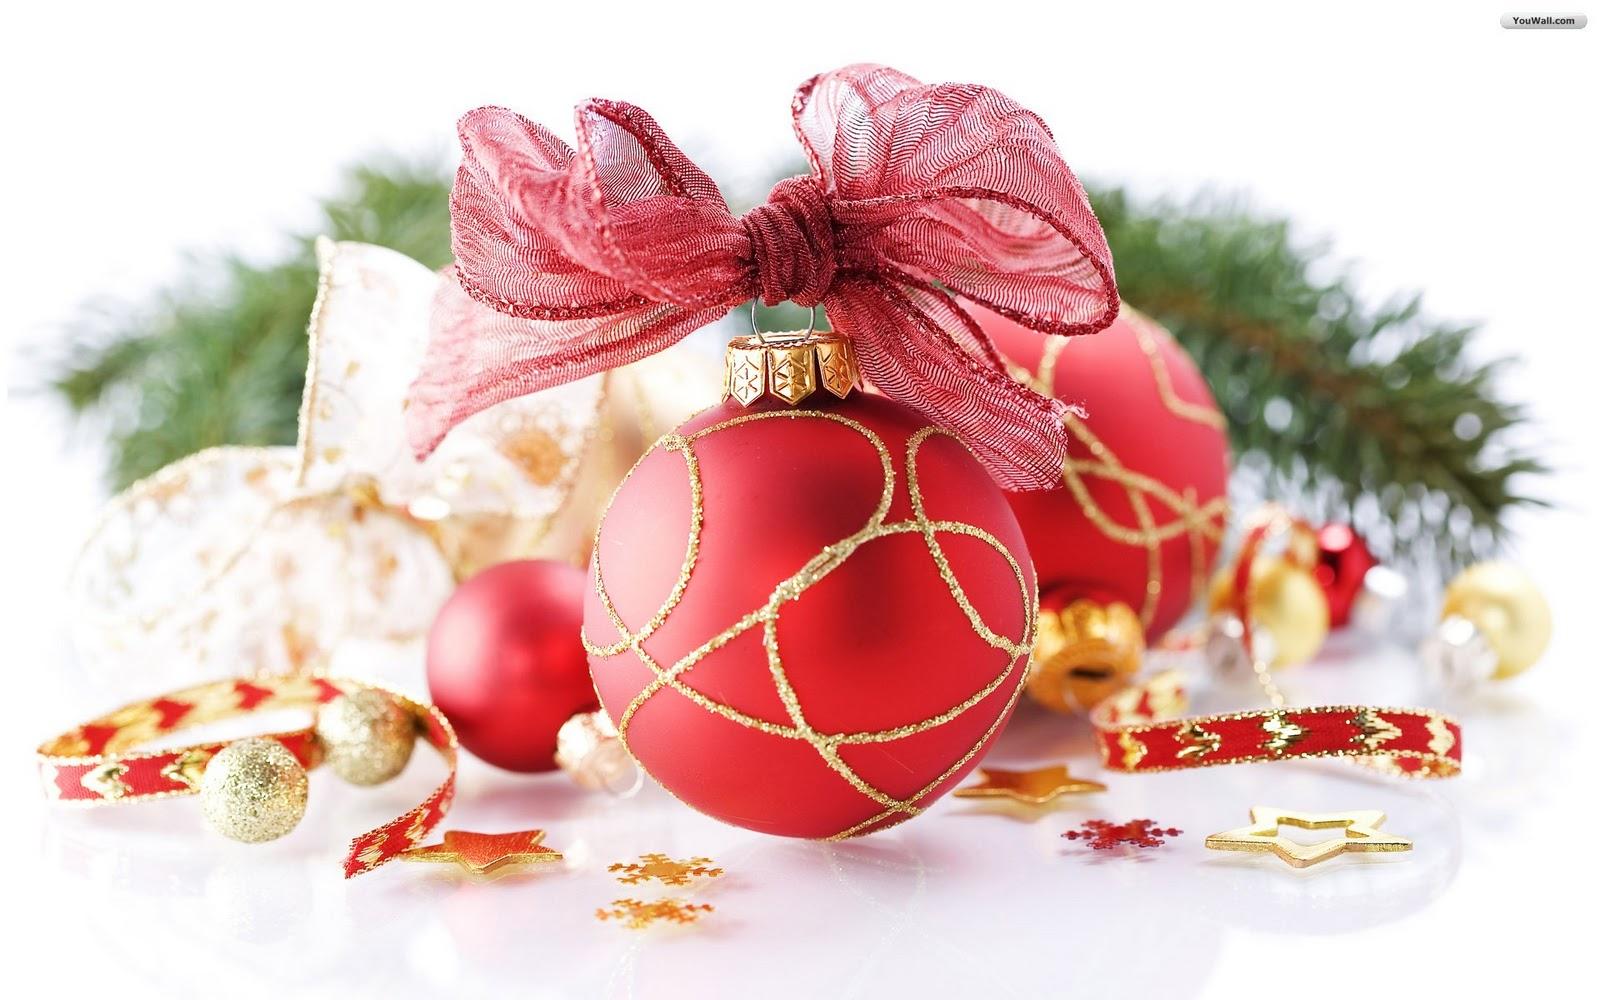 http://1.bp.blogspot.com/-hvKKX8HPme4/T24ACfrZedI/AAAAAAAAAW8/_qURsqbXgZU/s1600/Animated-Christmas-Wallpapers-11.jpg